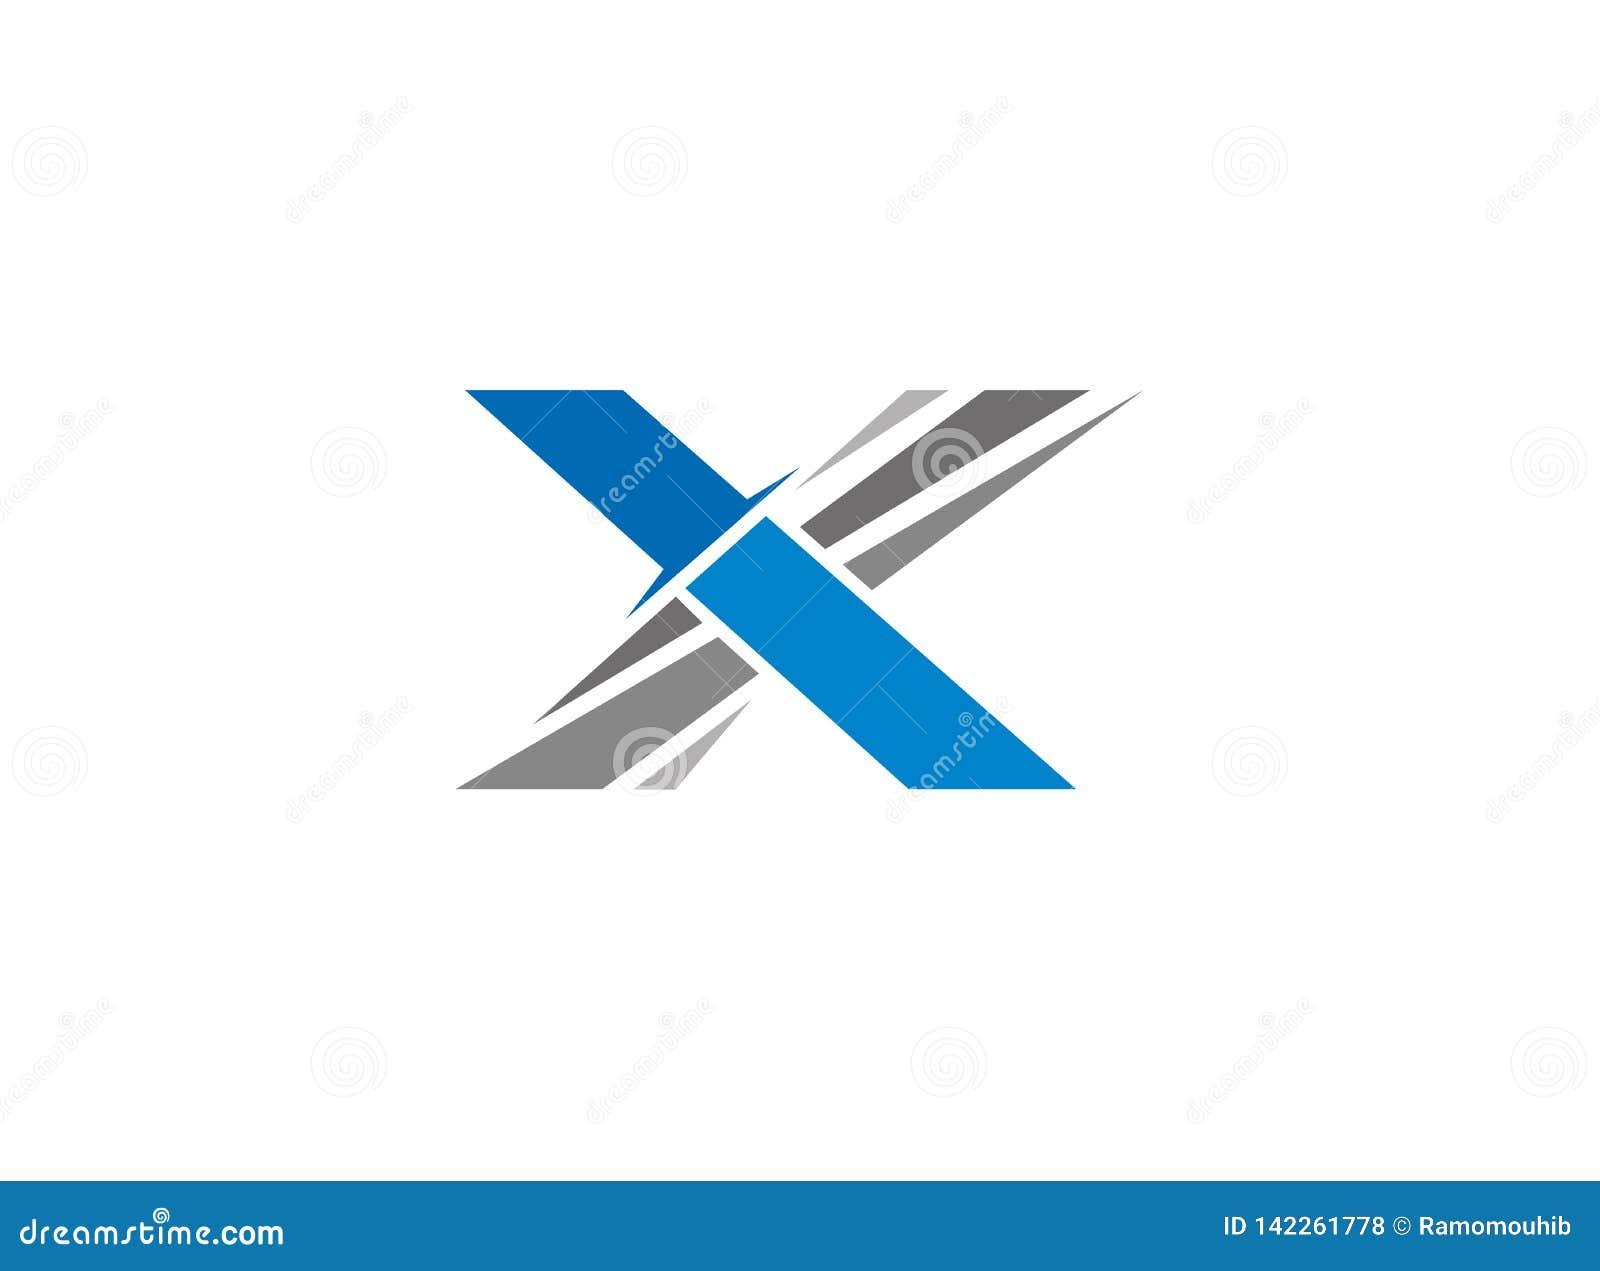 Messer-Klingen-Logo des Alphabet-X